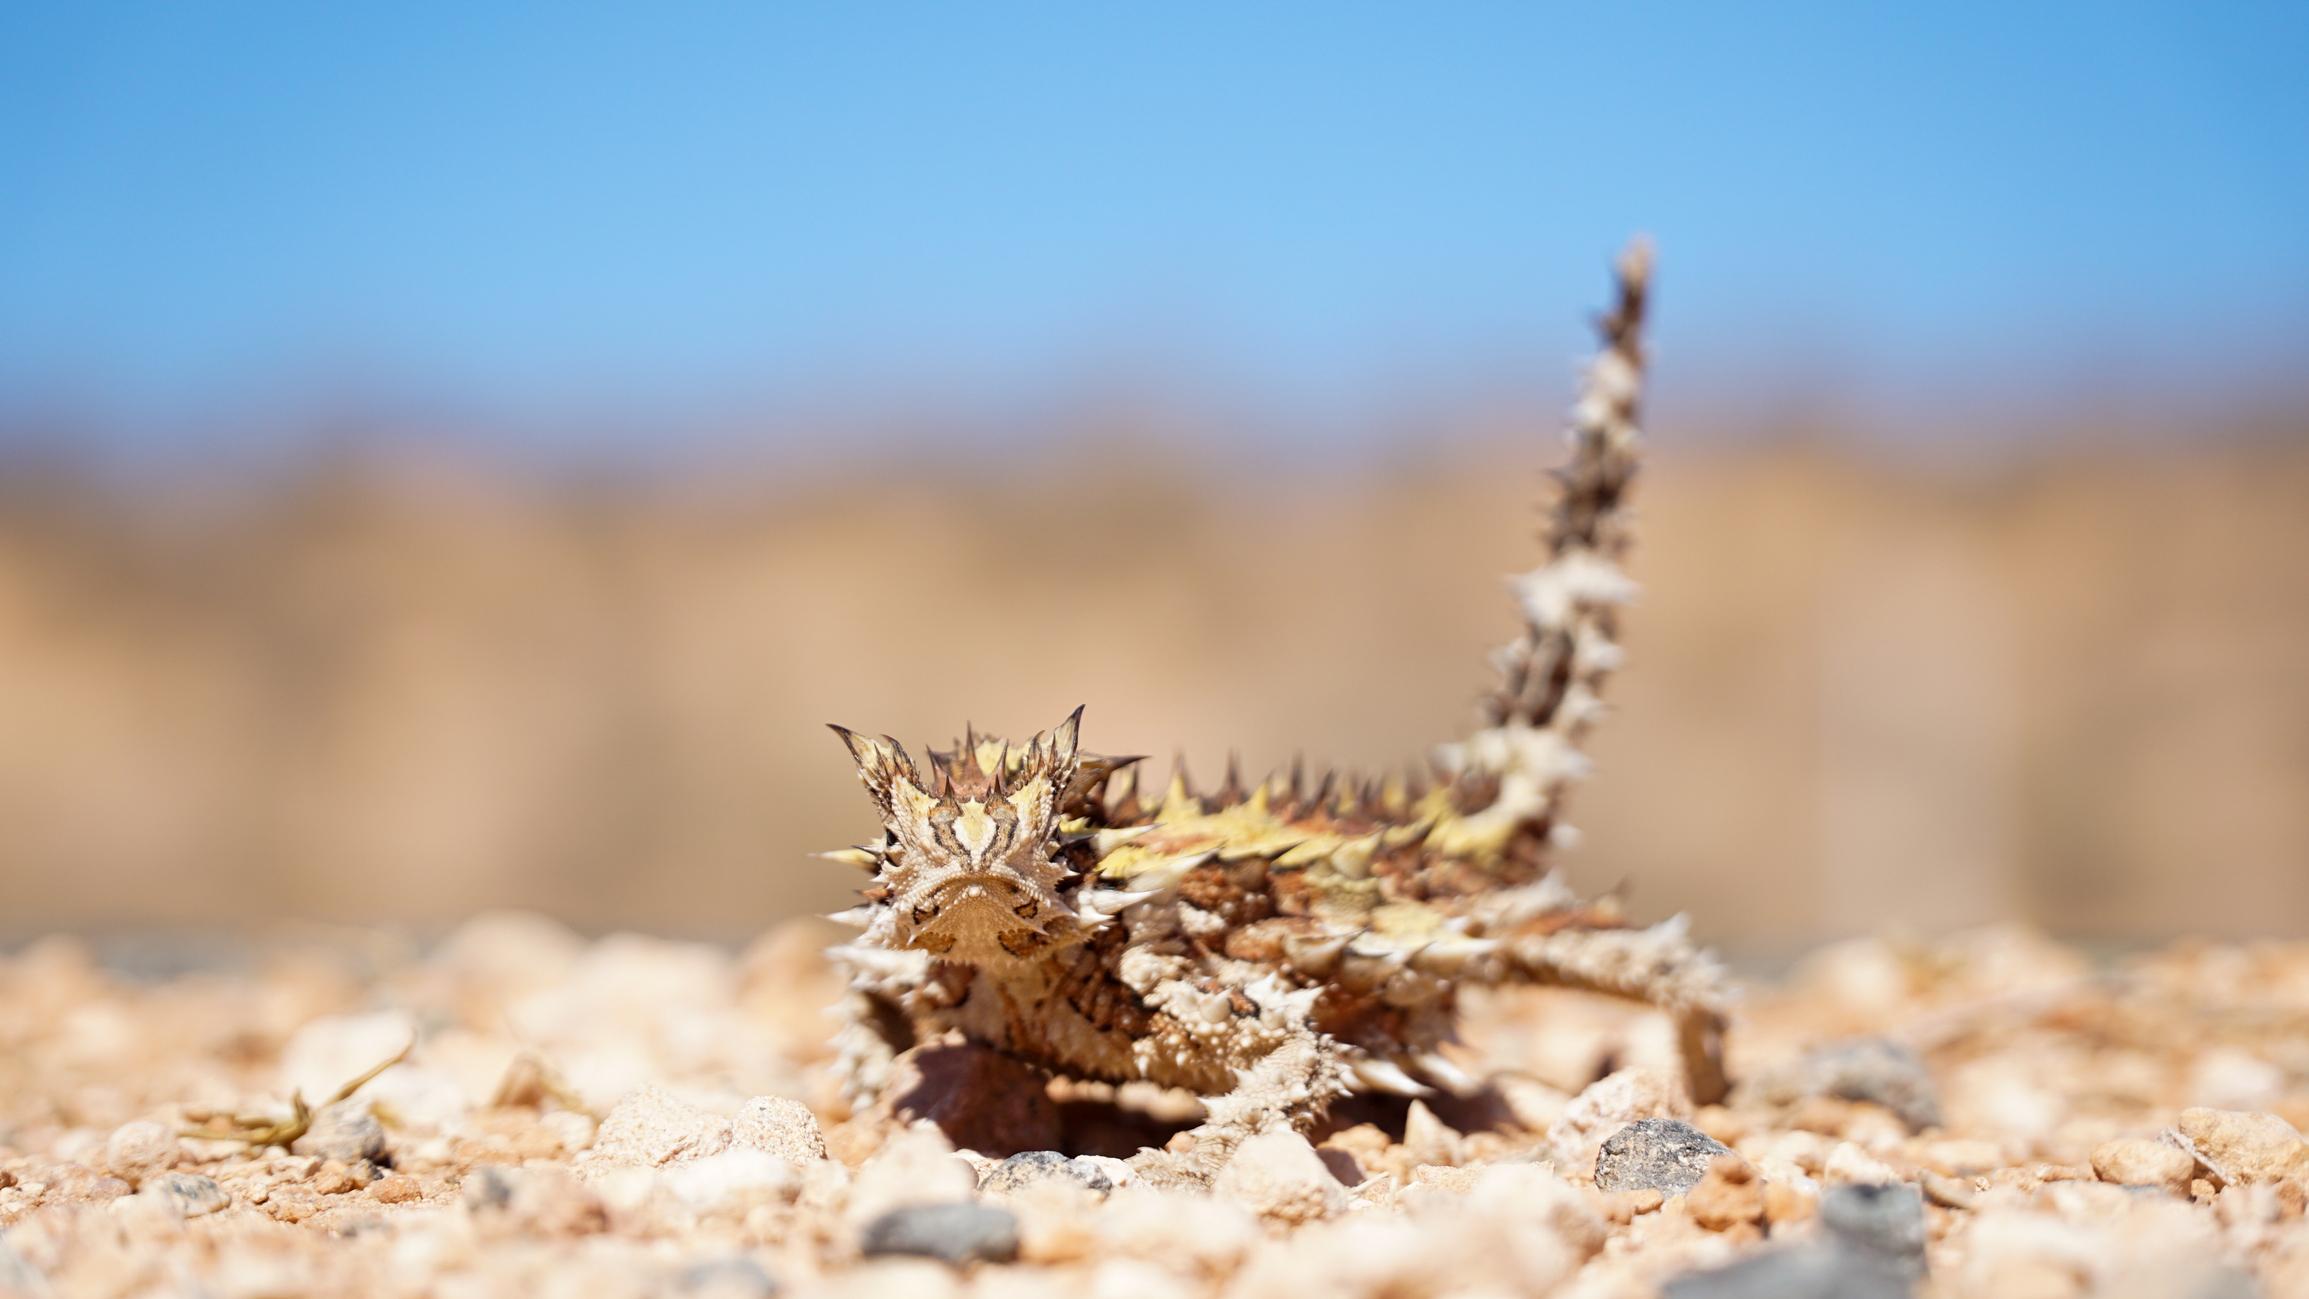 Thorny devil lizard walking on pebbles